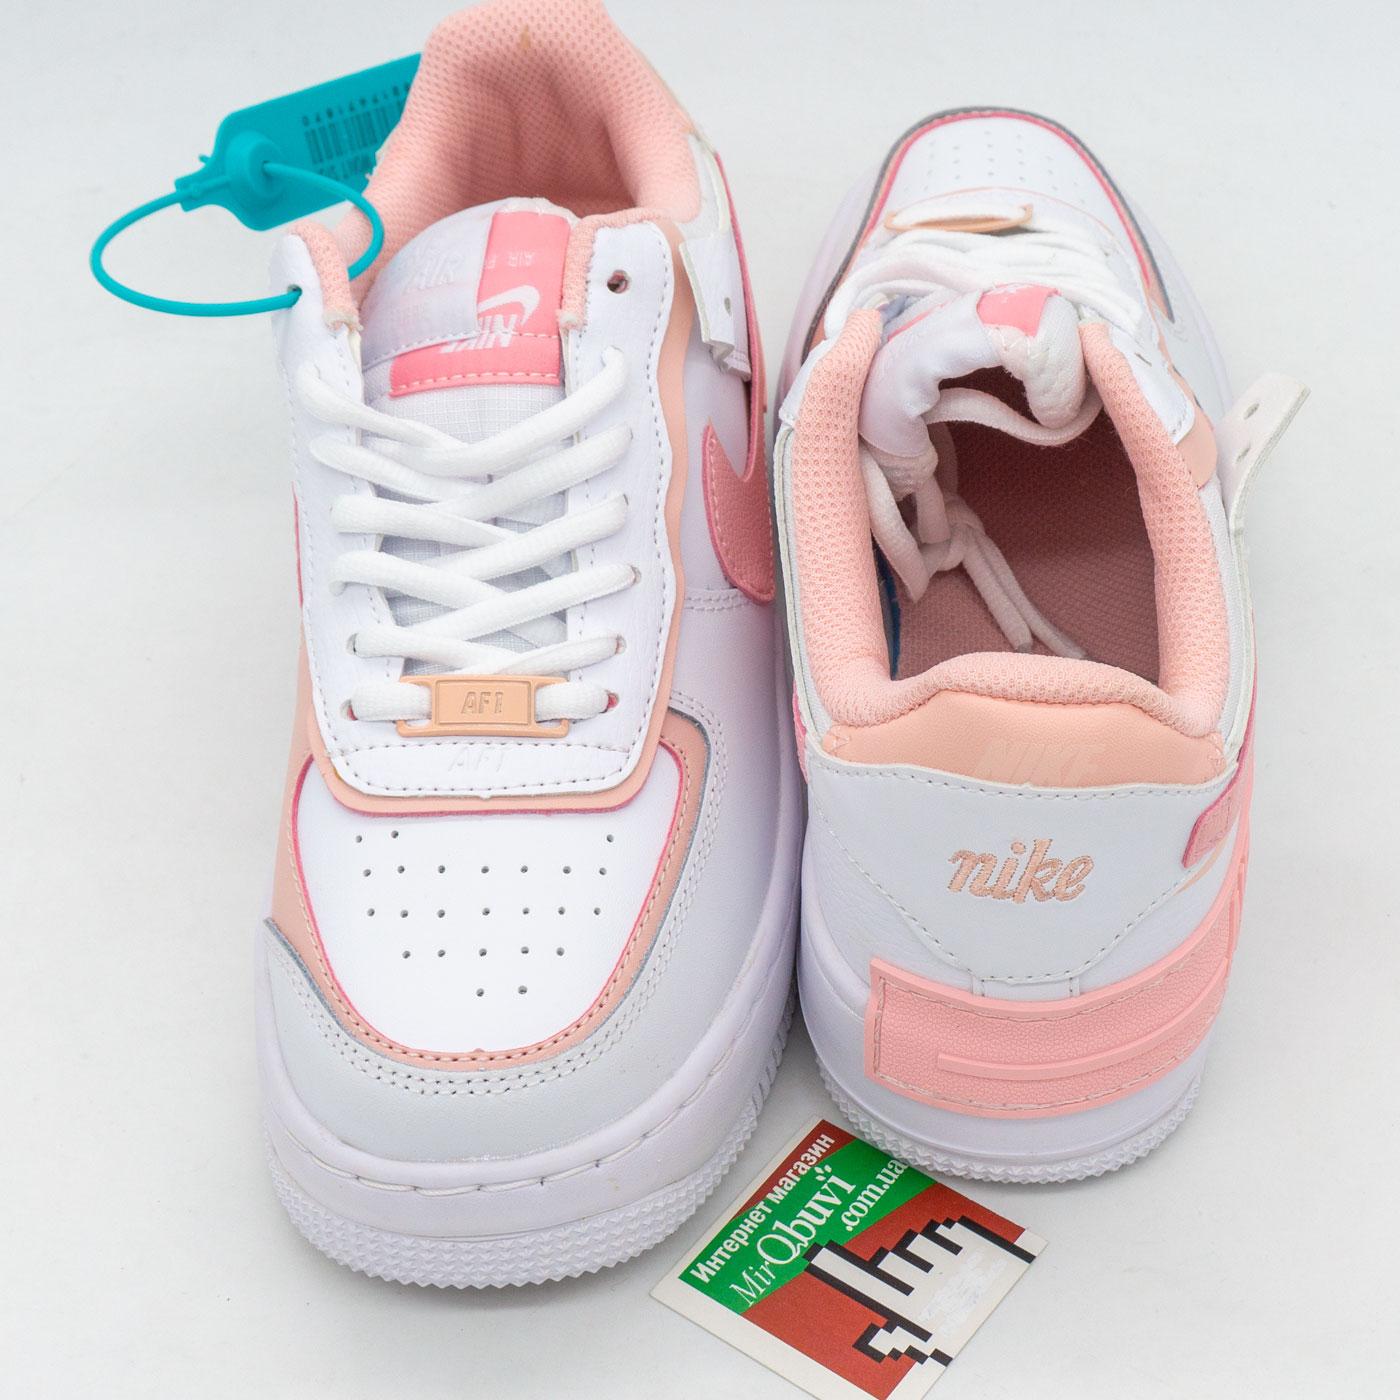 фото front Кроссовки Nike Air Force 1 Shadow бело-розовые - Топ качество front